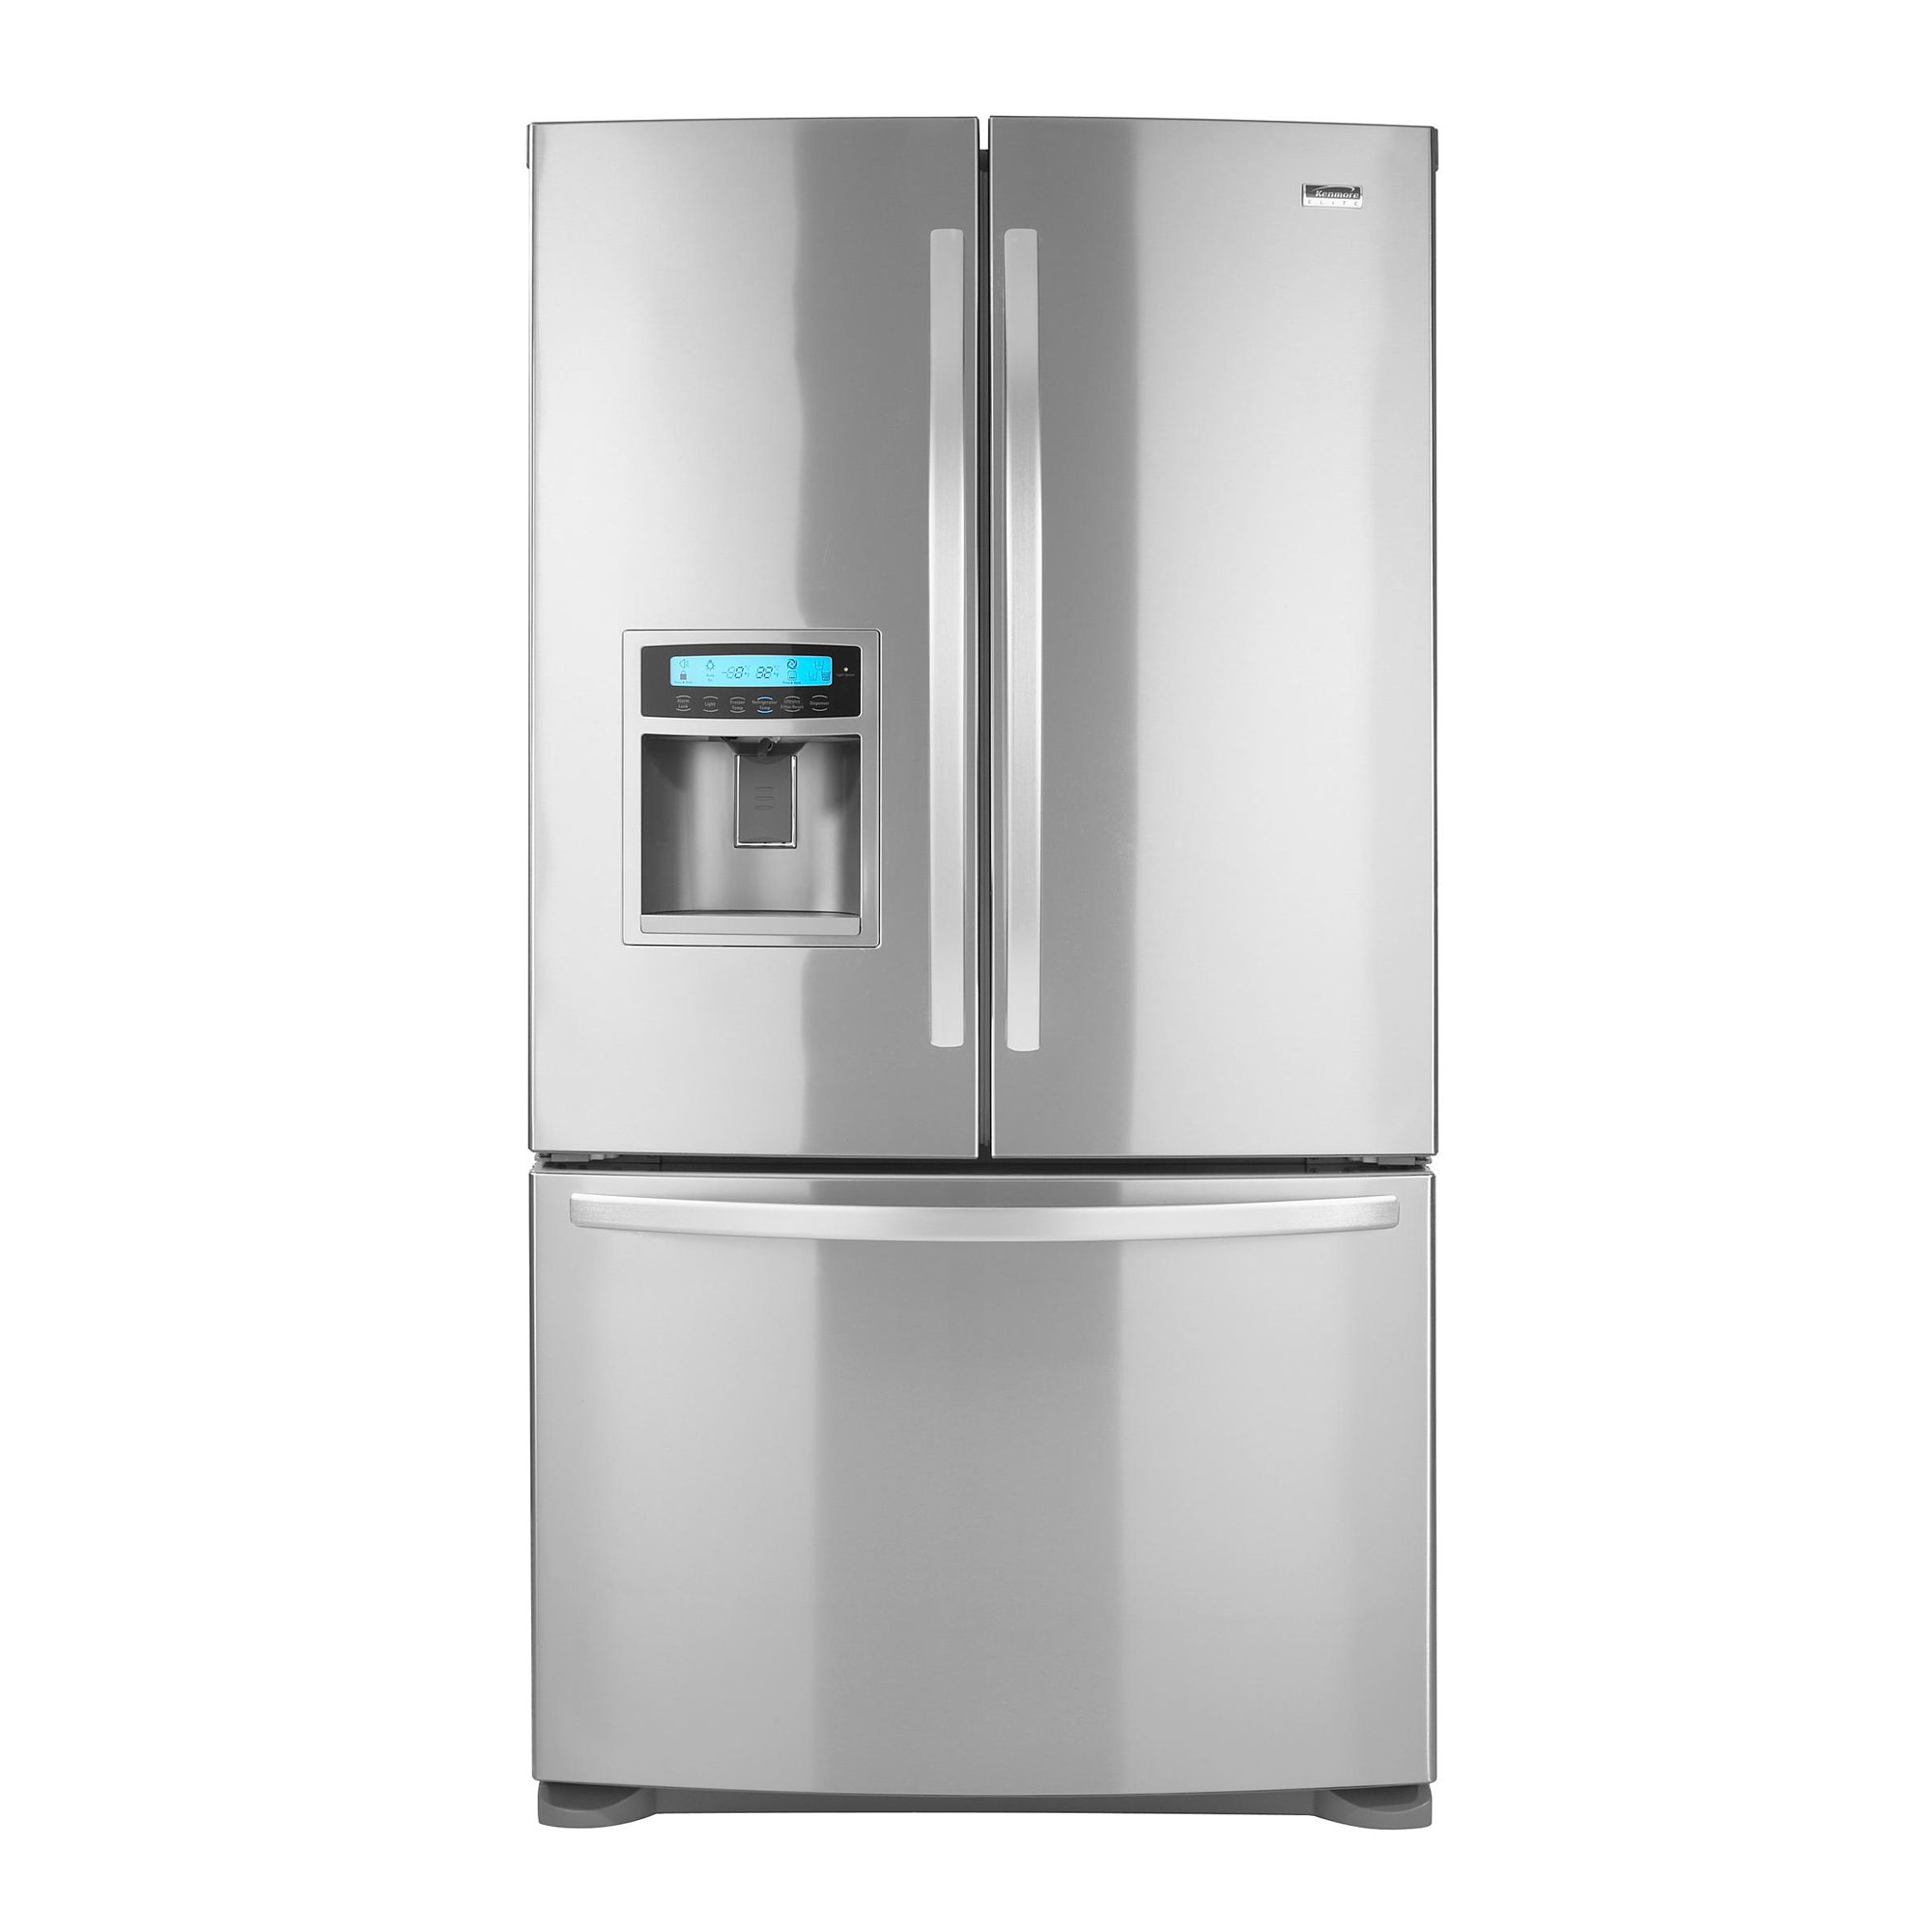 Win a Kenmore Elite French Door Refrigerator